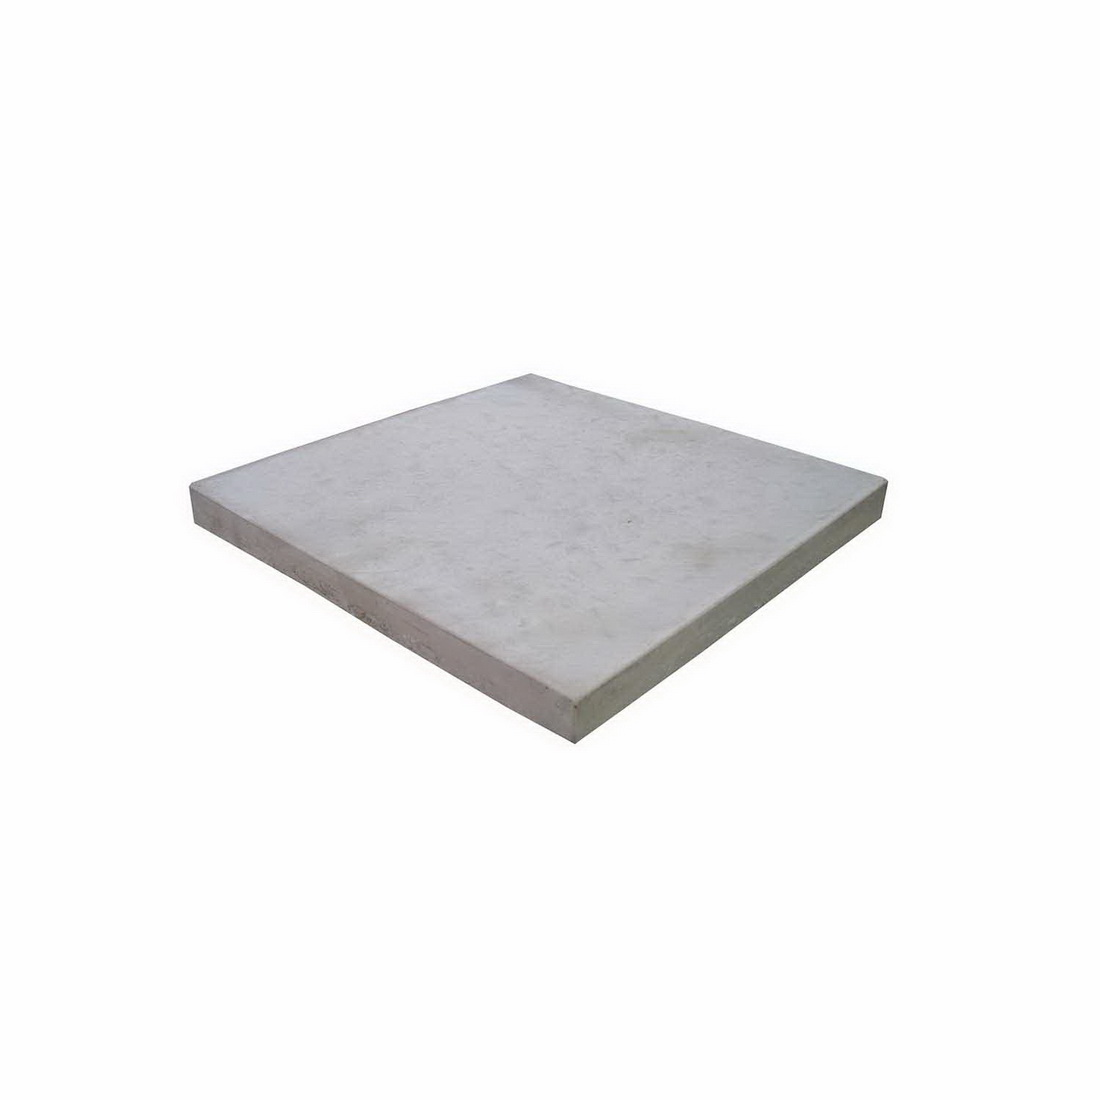 Milano Concrete Paver 300 x 300 x 37mm Natural Stone